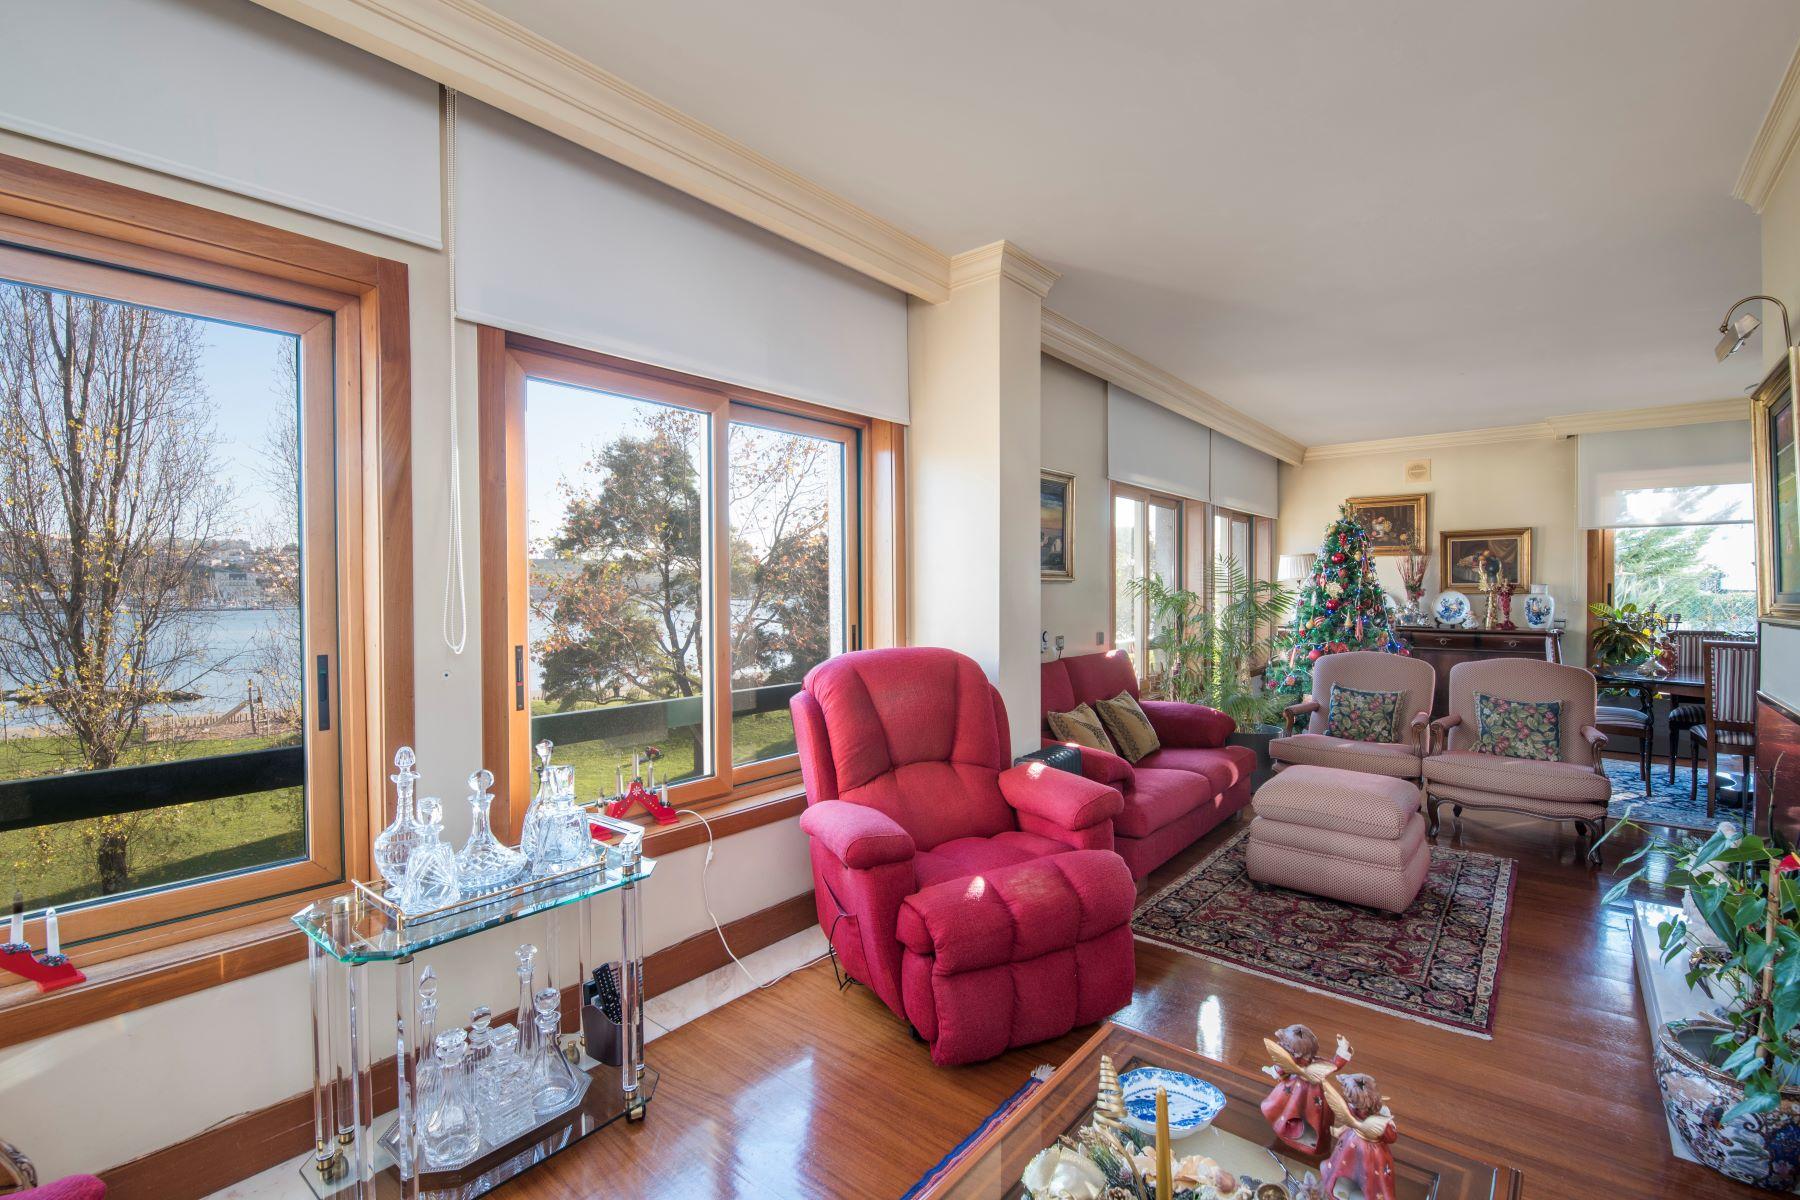 独户住宅 为 销售 在 Apartment Floor Dwelling, 5 bedrooms, for Sale 波尔图, 波尔图, 葡萄牙